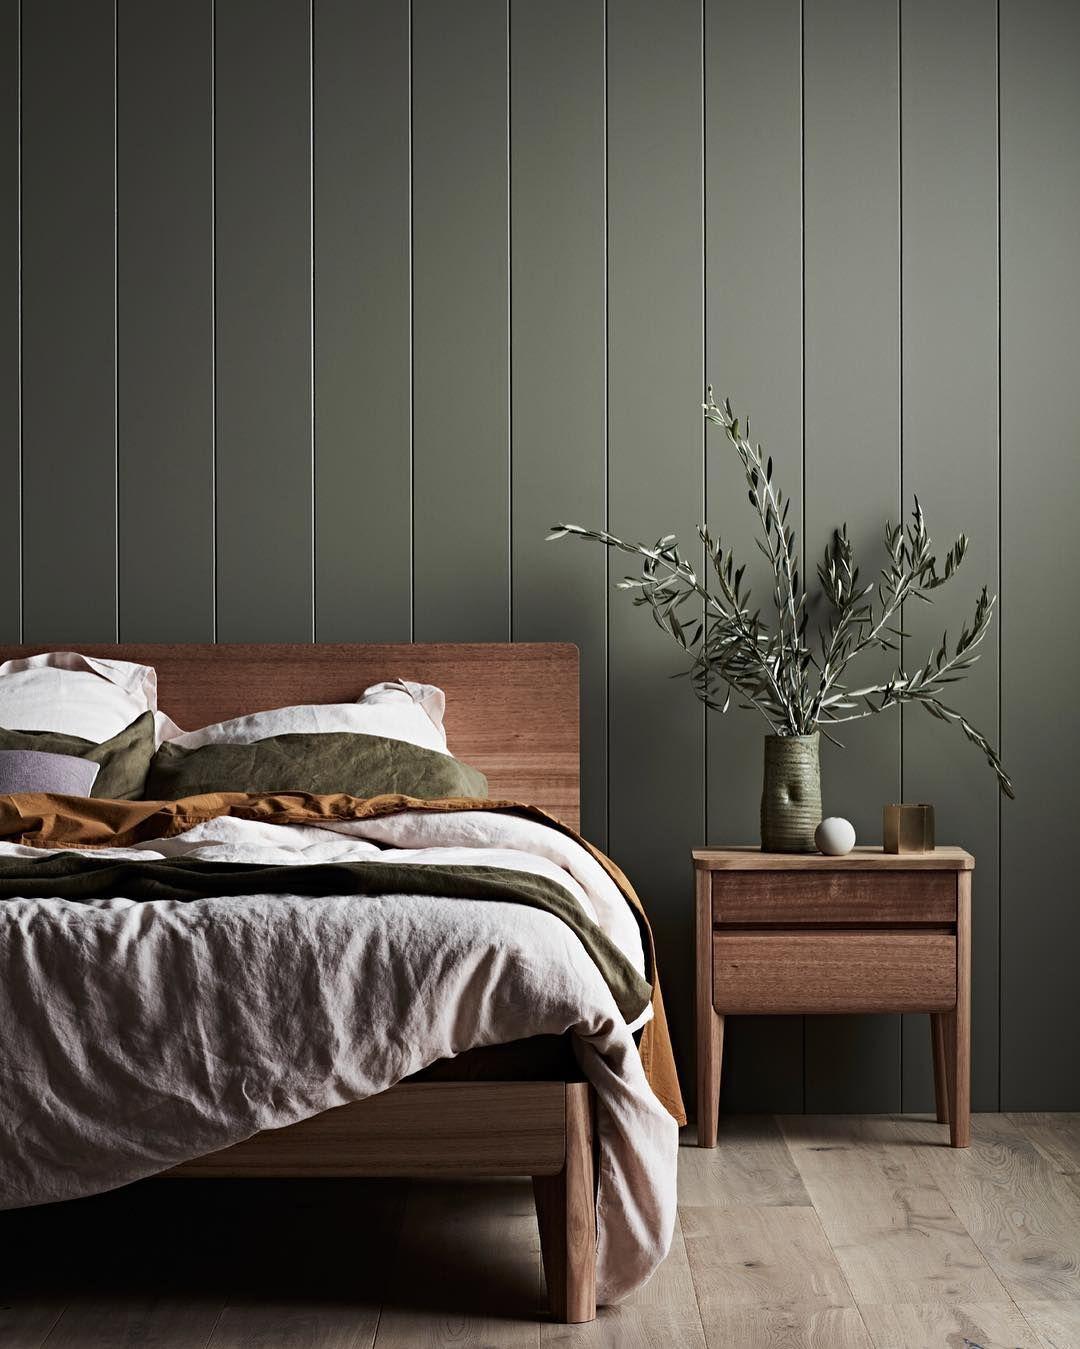 Pin by Kassandra DeKoning on Bedrooms in 2019 Olive